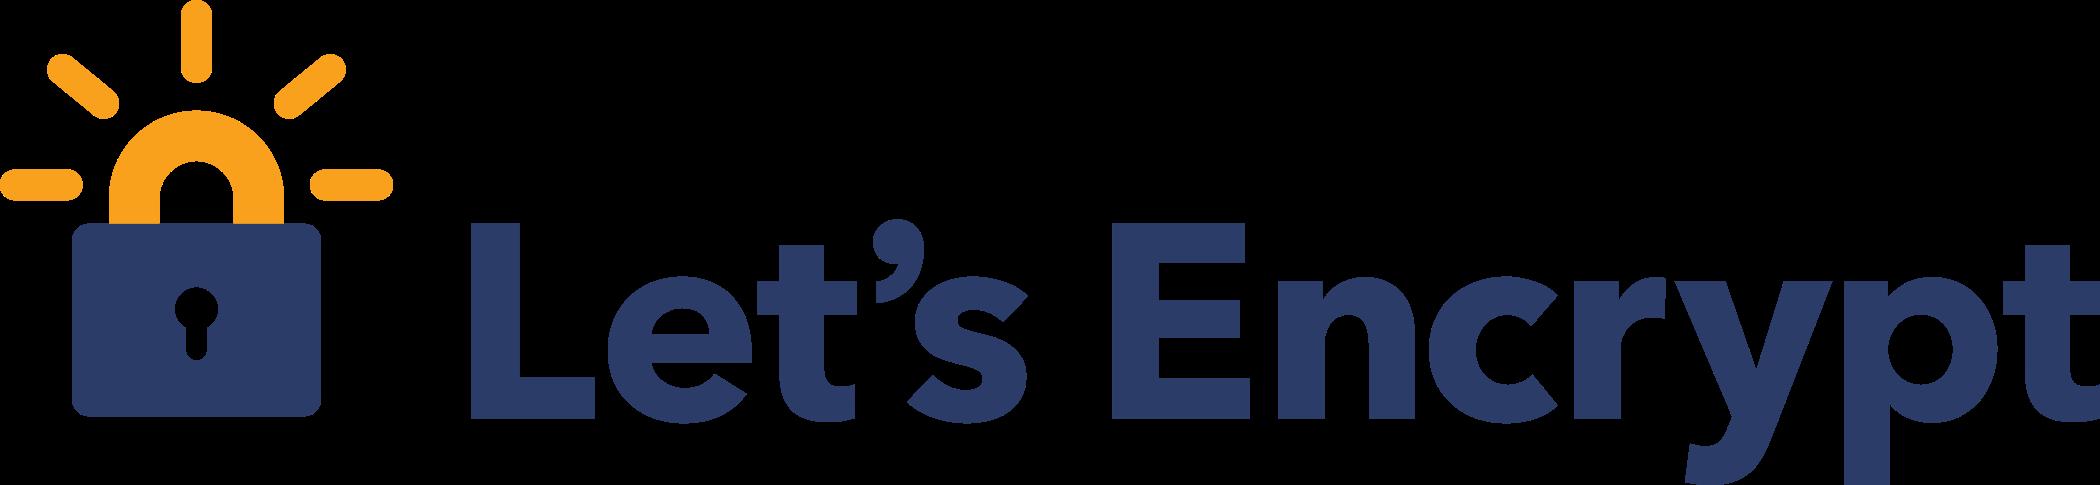 lets-encrypt-logo-1